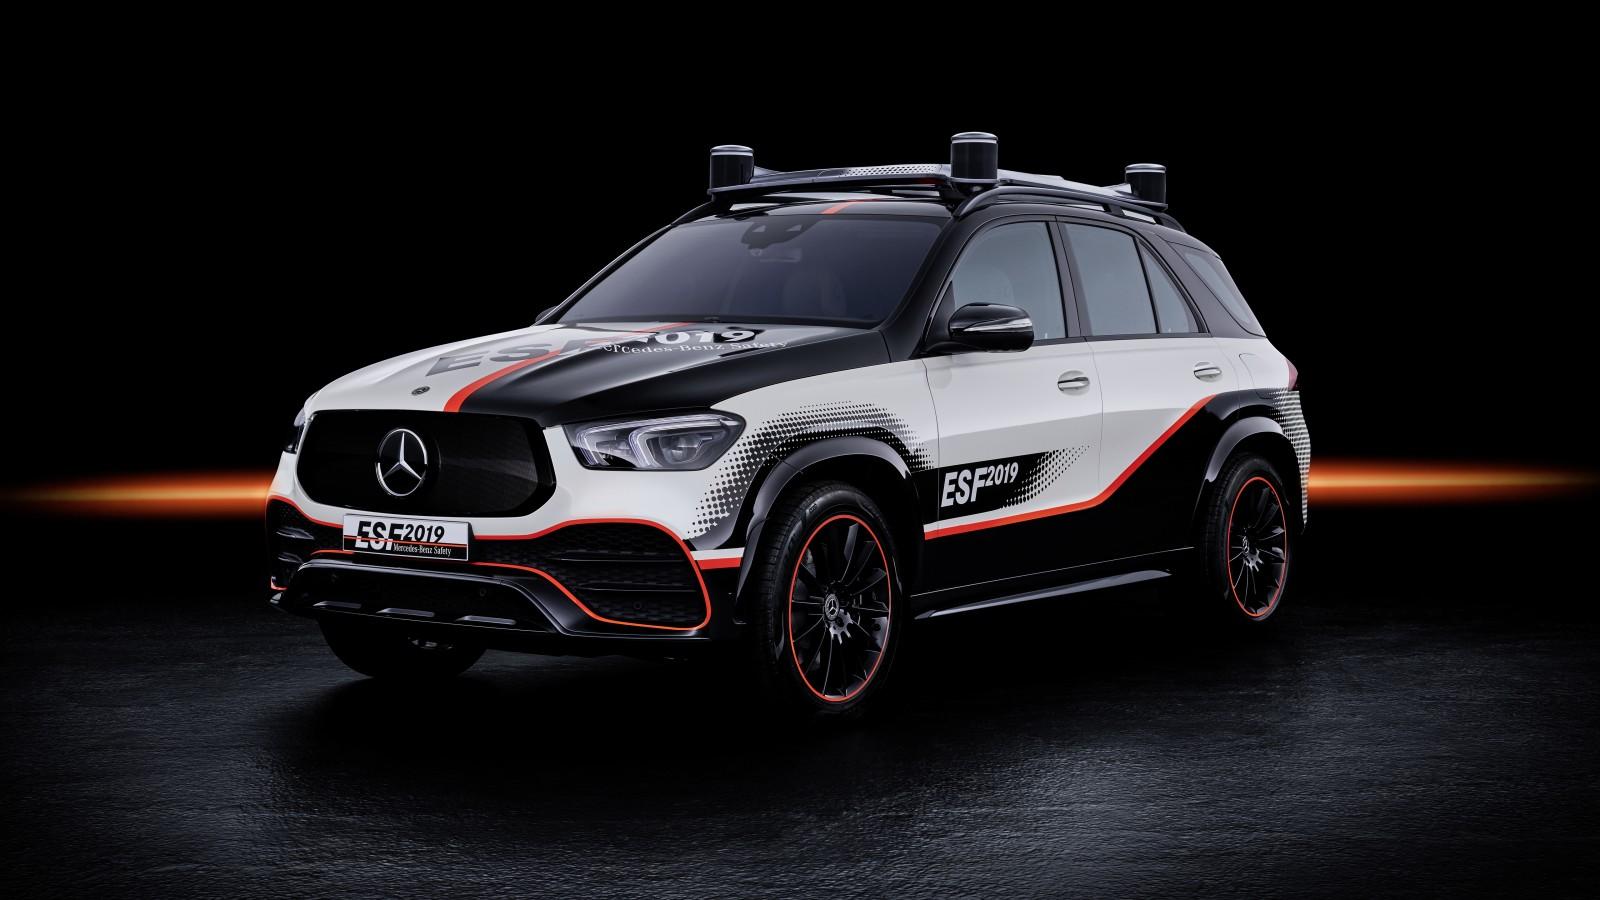 Mercedes-Benz GLE-Klasse ESF Concept 2019 5K Wallpaper